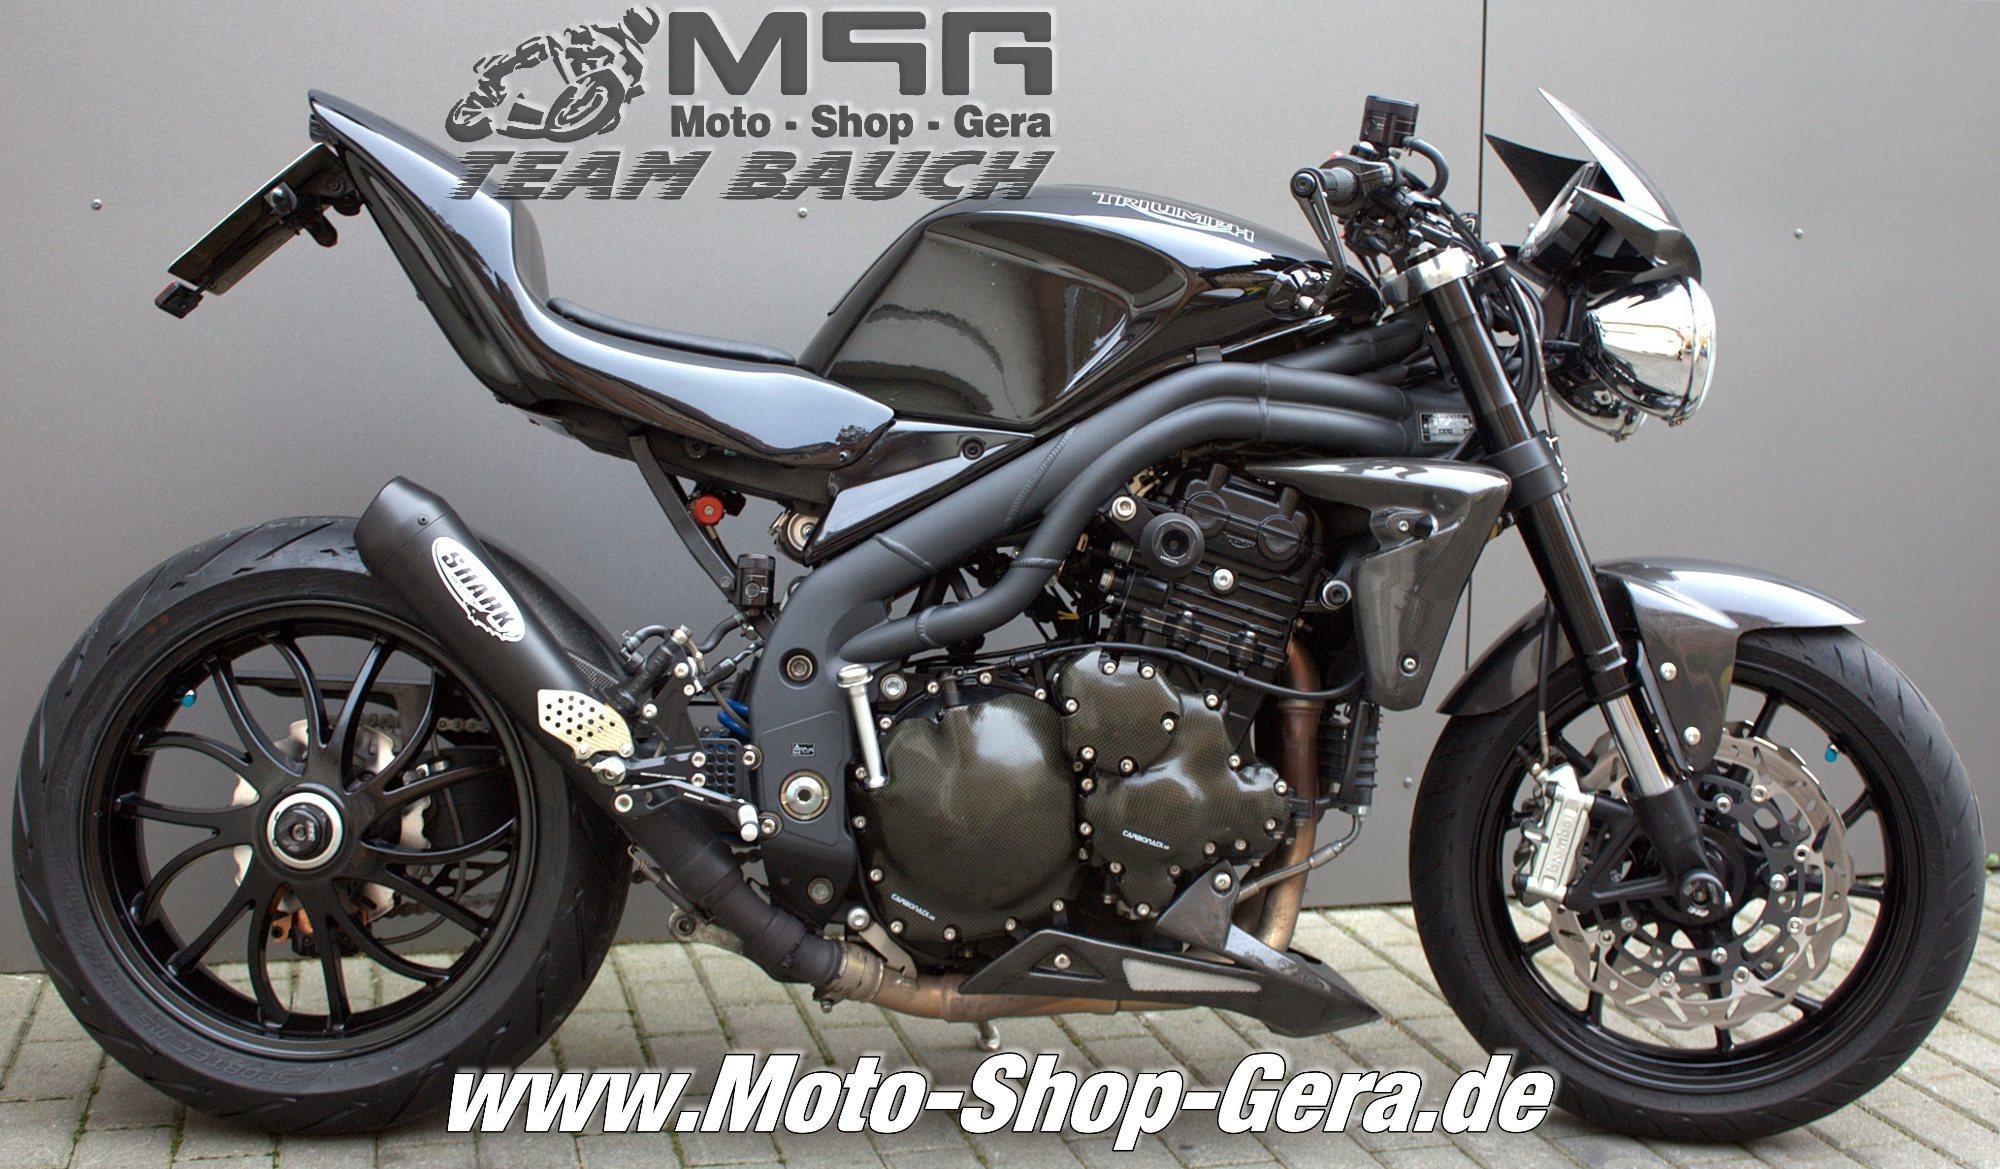 umgebautes motorrad triumph speed triple 1050 von msg moto shop gera team bauch ohg. Black Bedroom Furniture Sets. Home Design Ideas